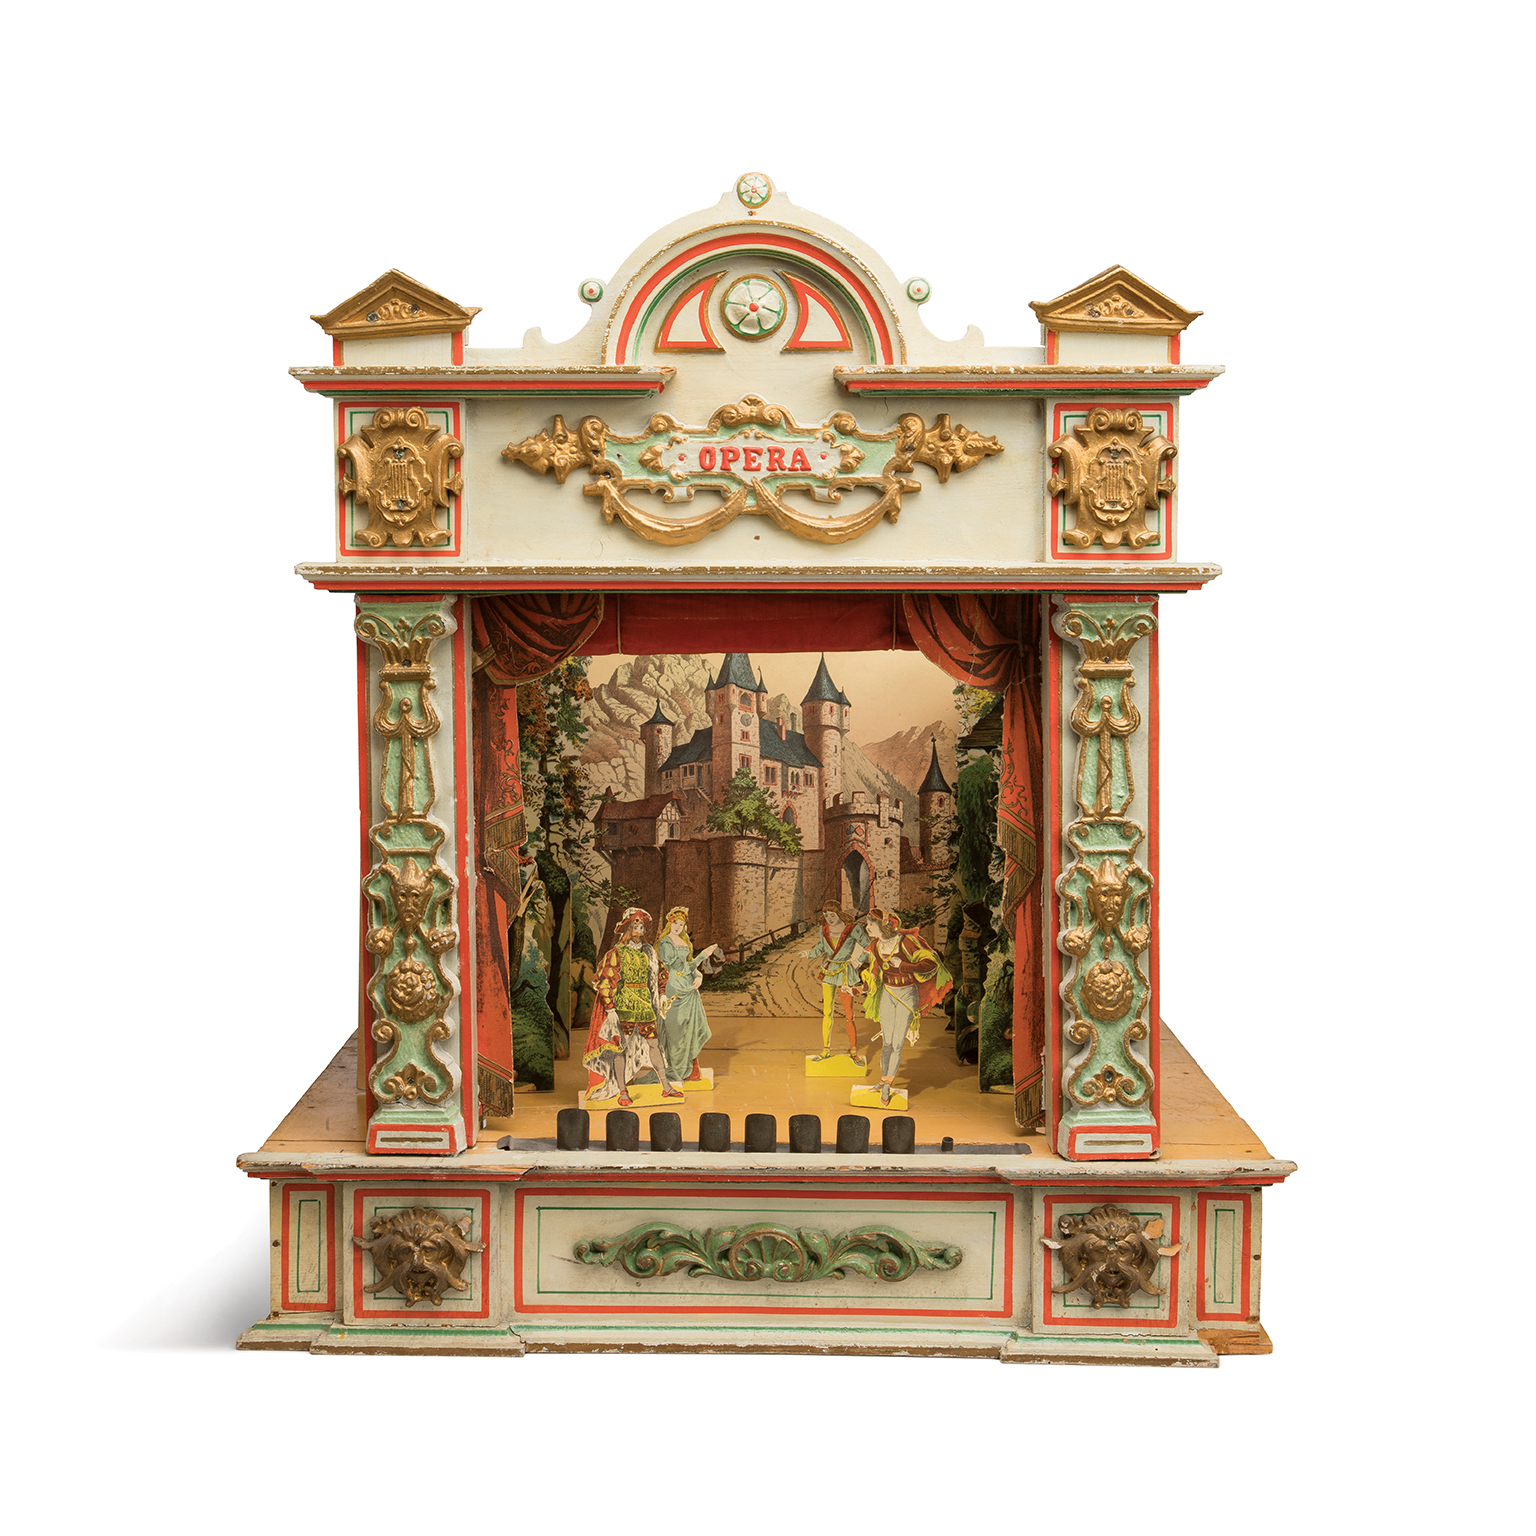 Opera Toy Theater